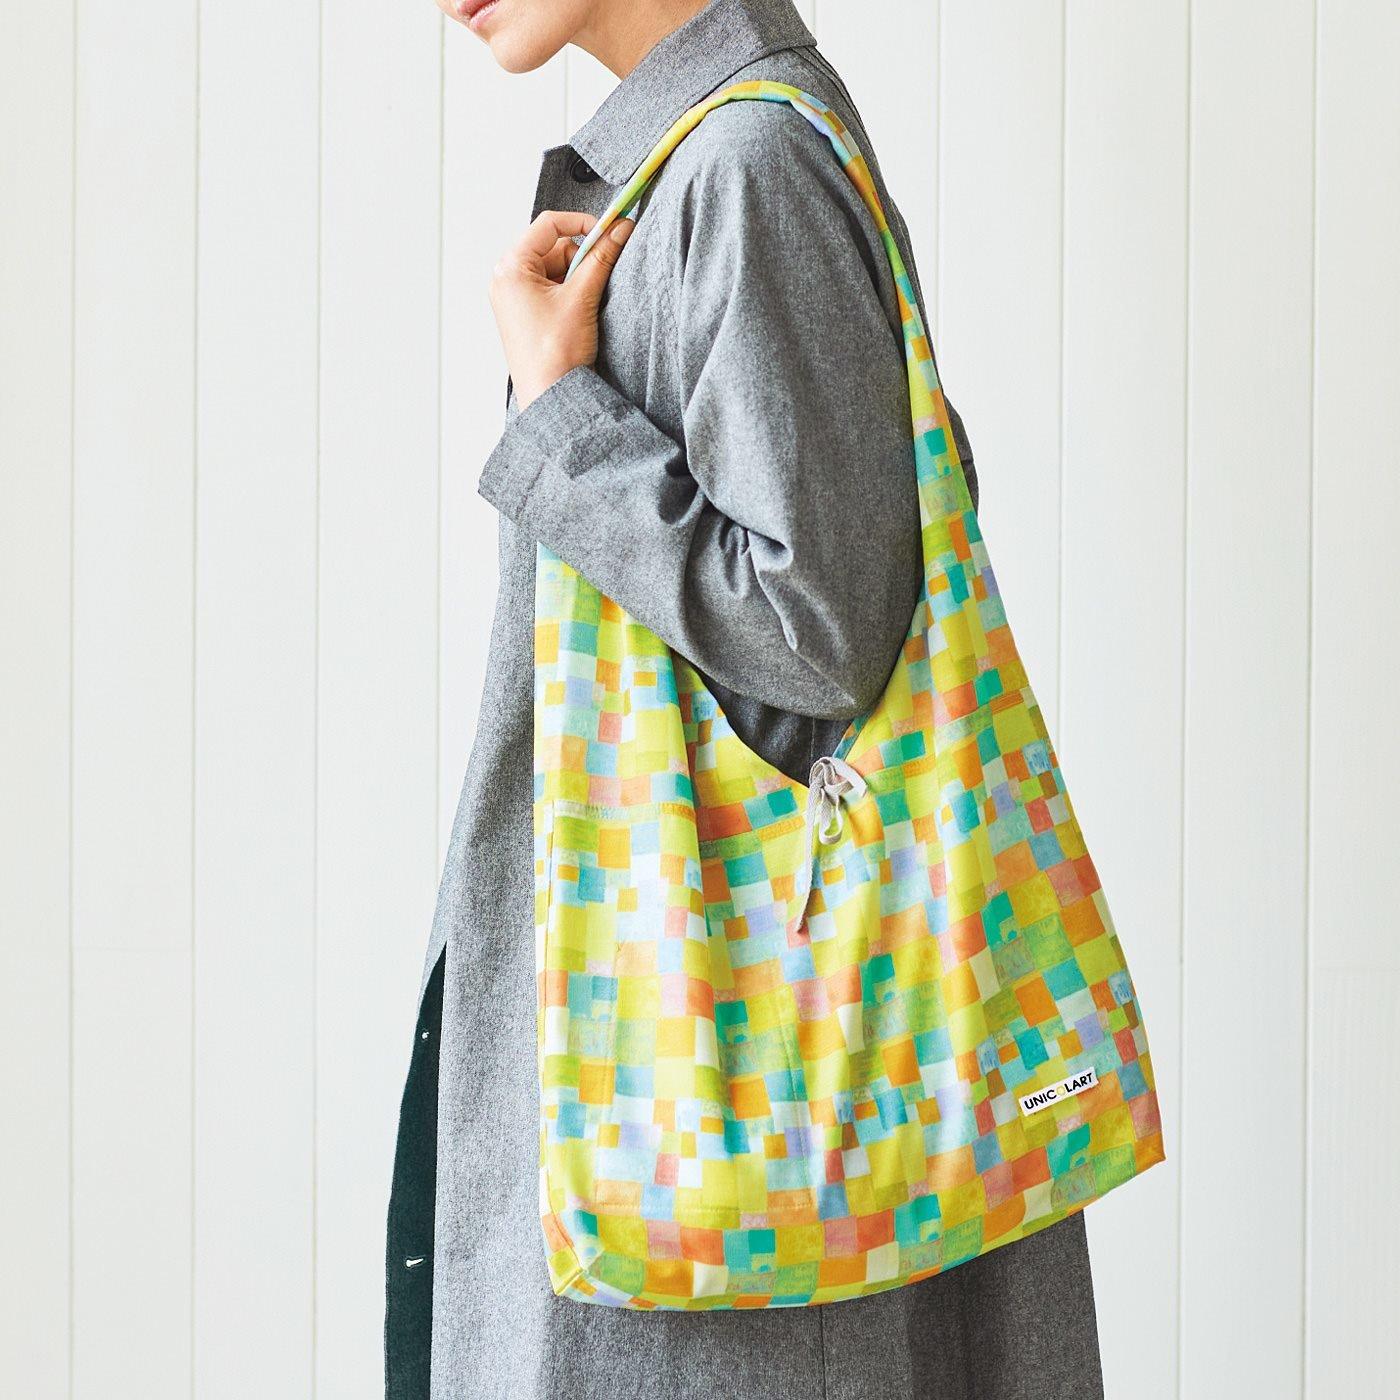 CCP ユニカラート アートがコーディネイトのアクセントになるたっぷりテキスタイルバッグ